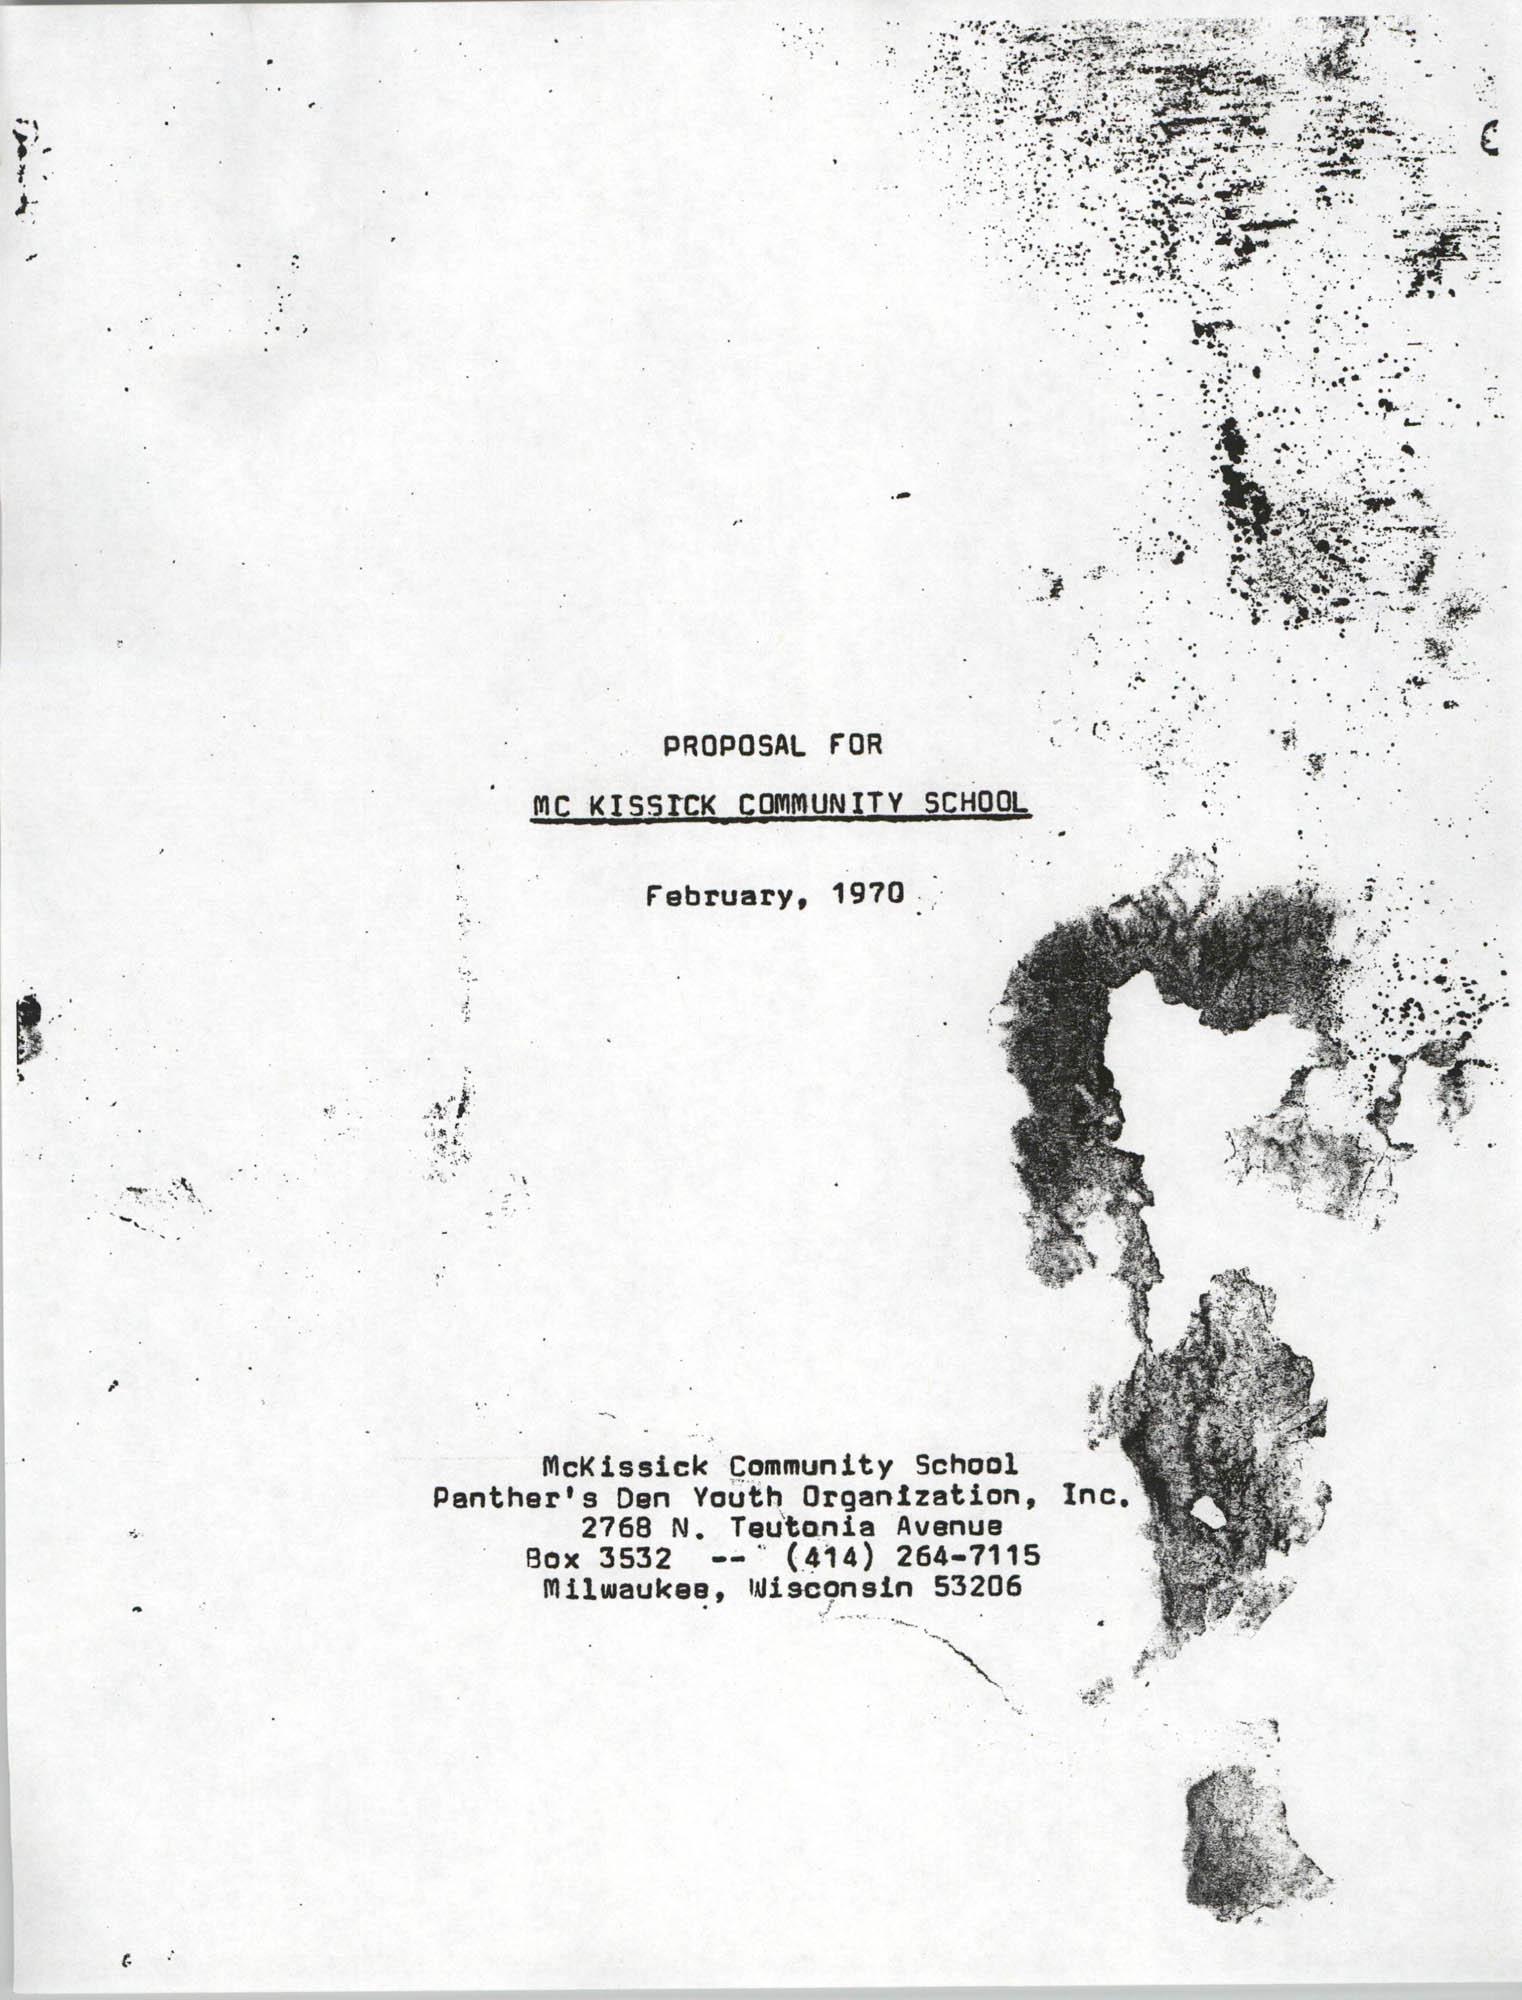 Proposal for McKissick Community School, February 1970